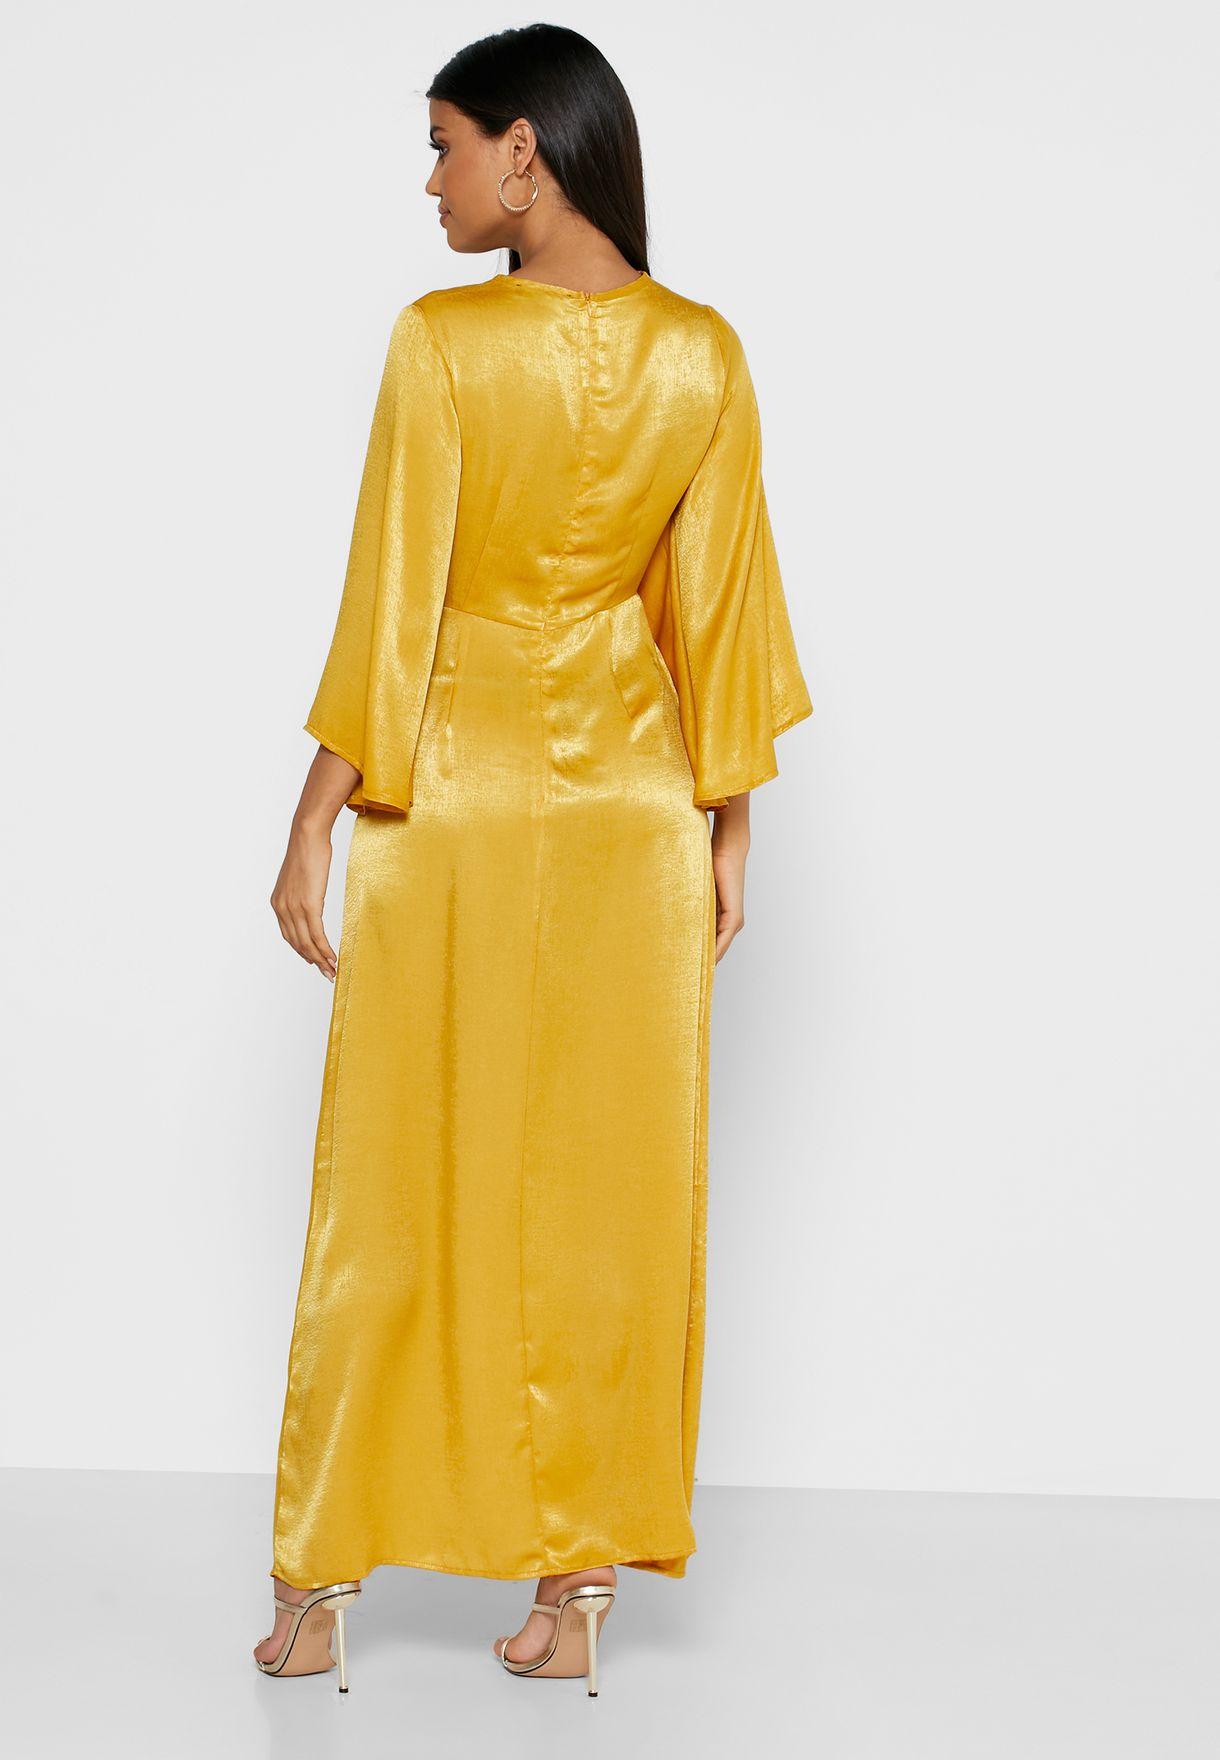 فستان ماكسي ساتان بأكمام واسعة